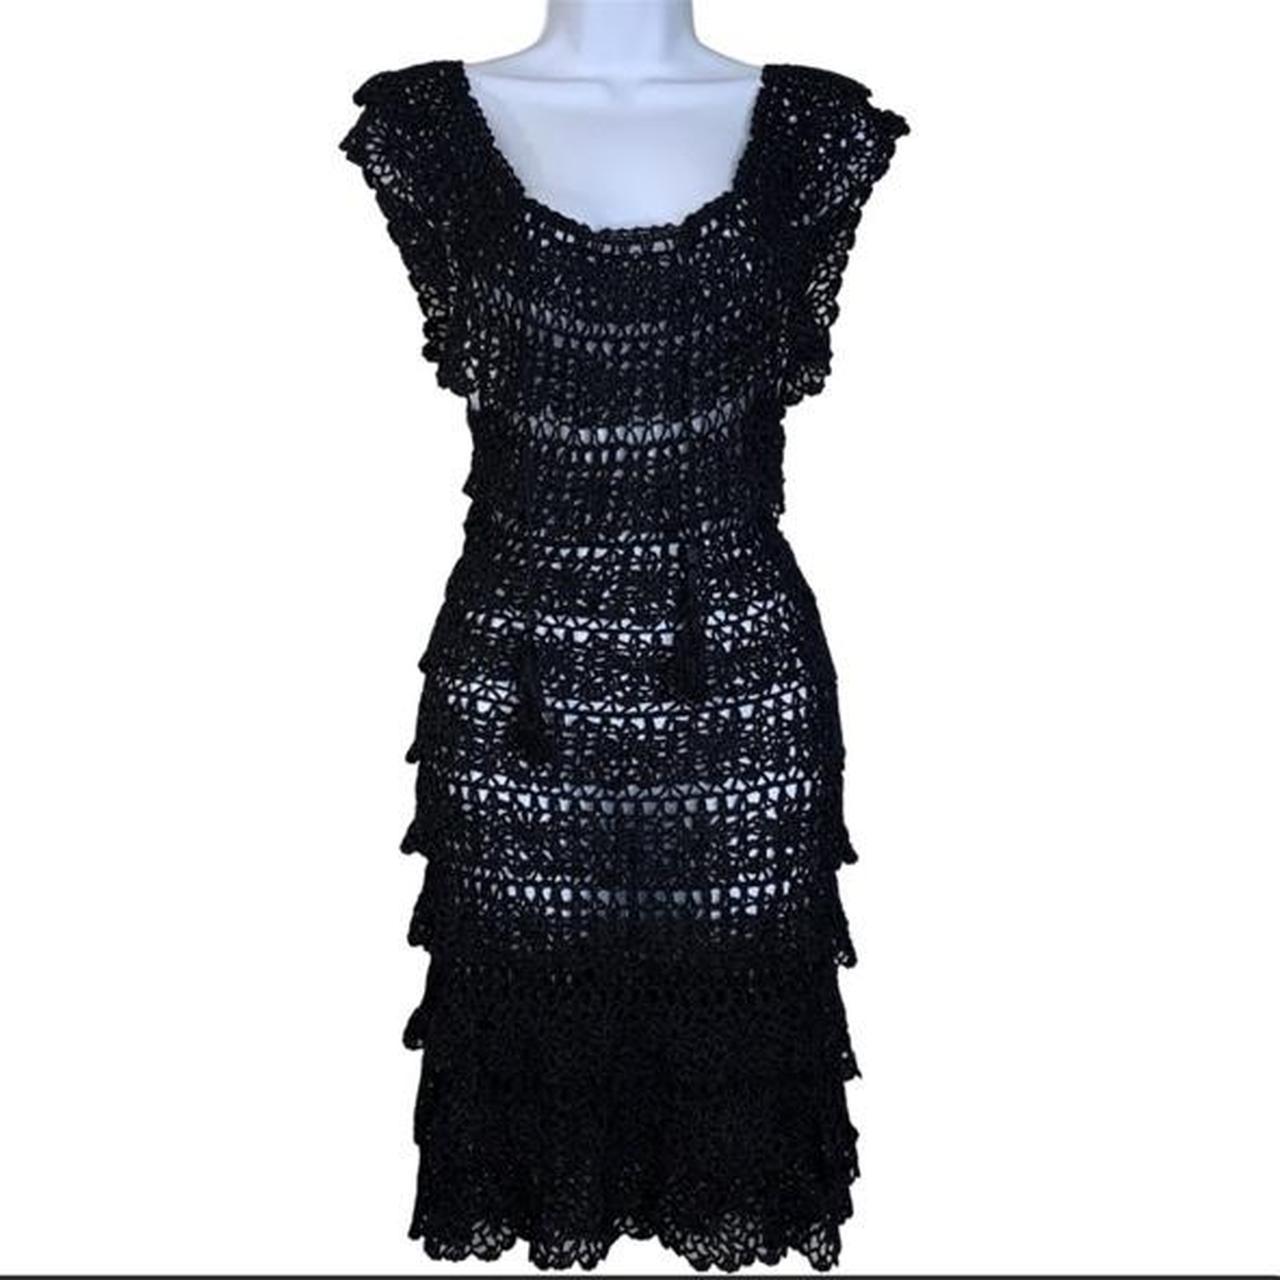 Product Image 1 - Rat & Boa Crochet Dress